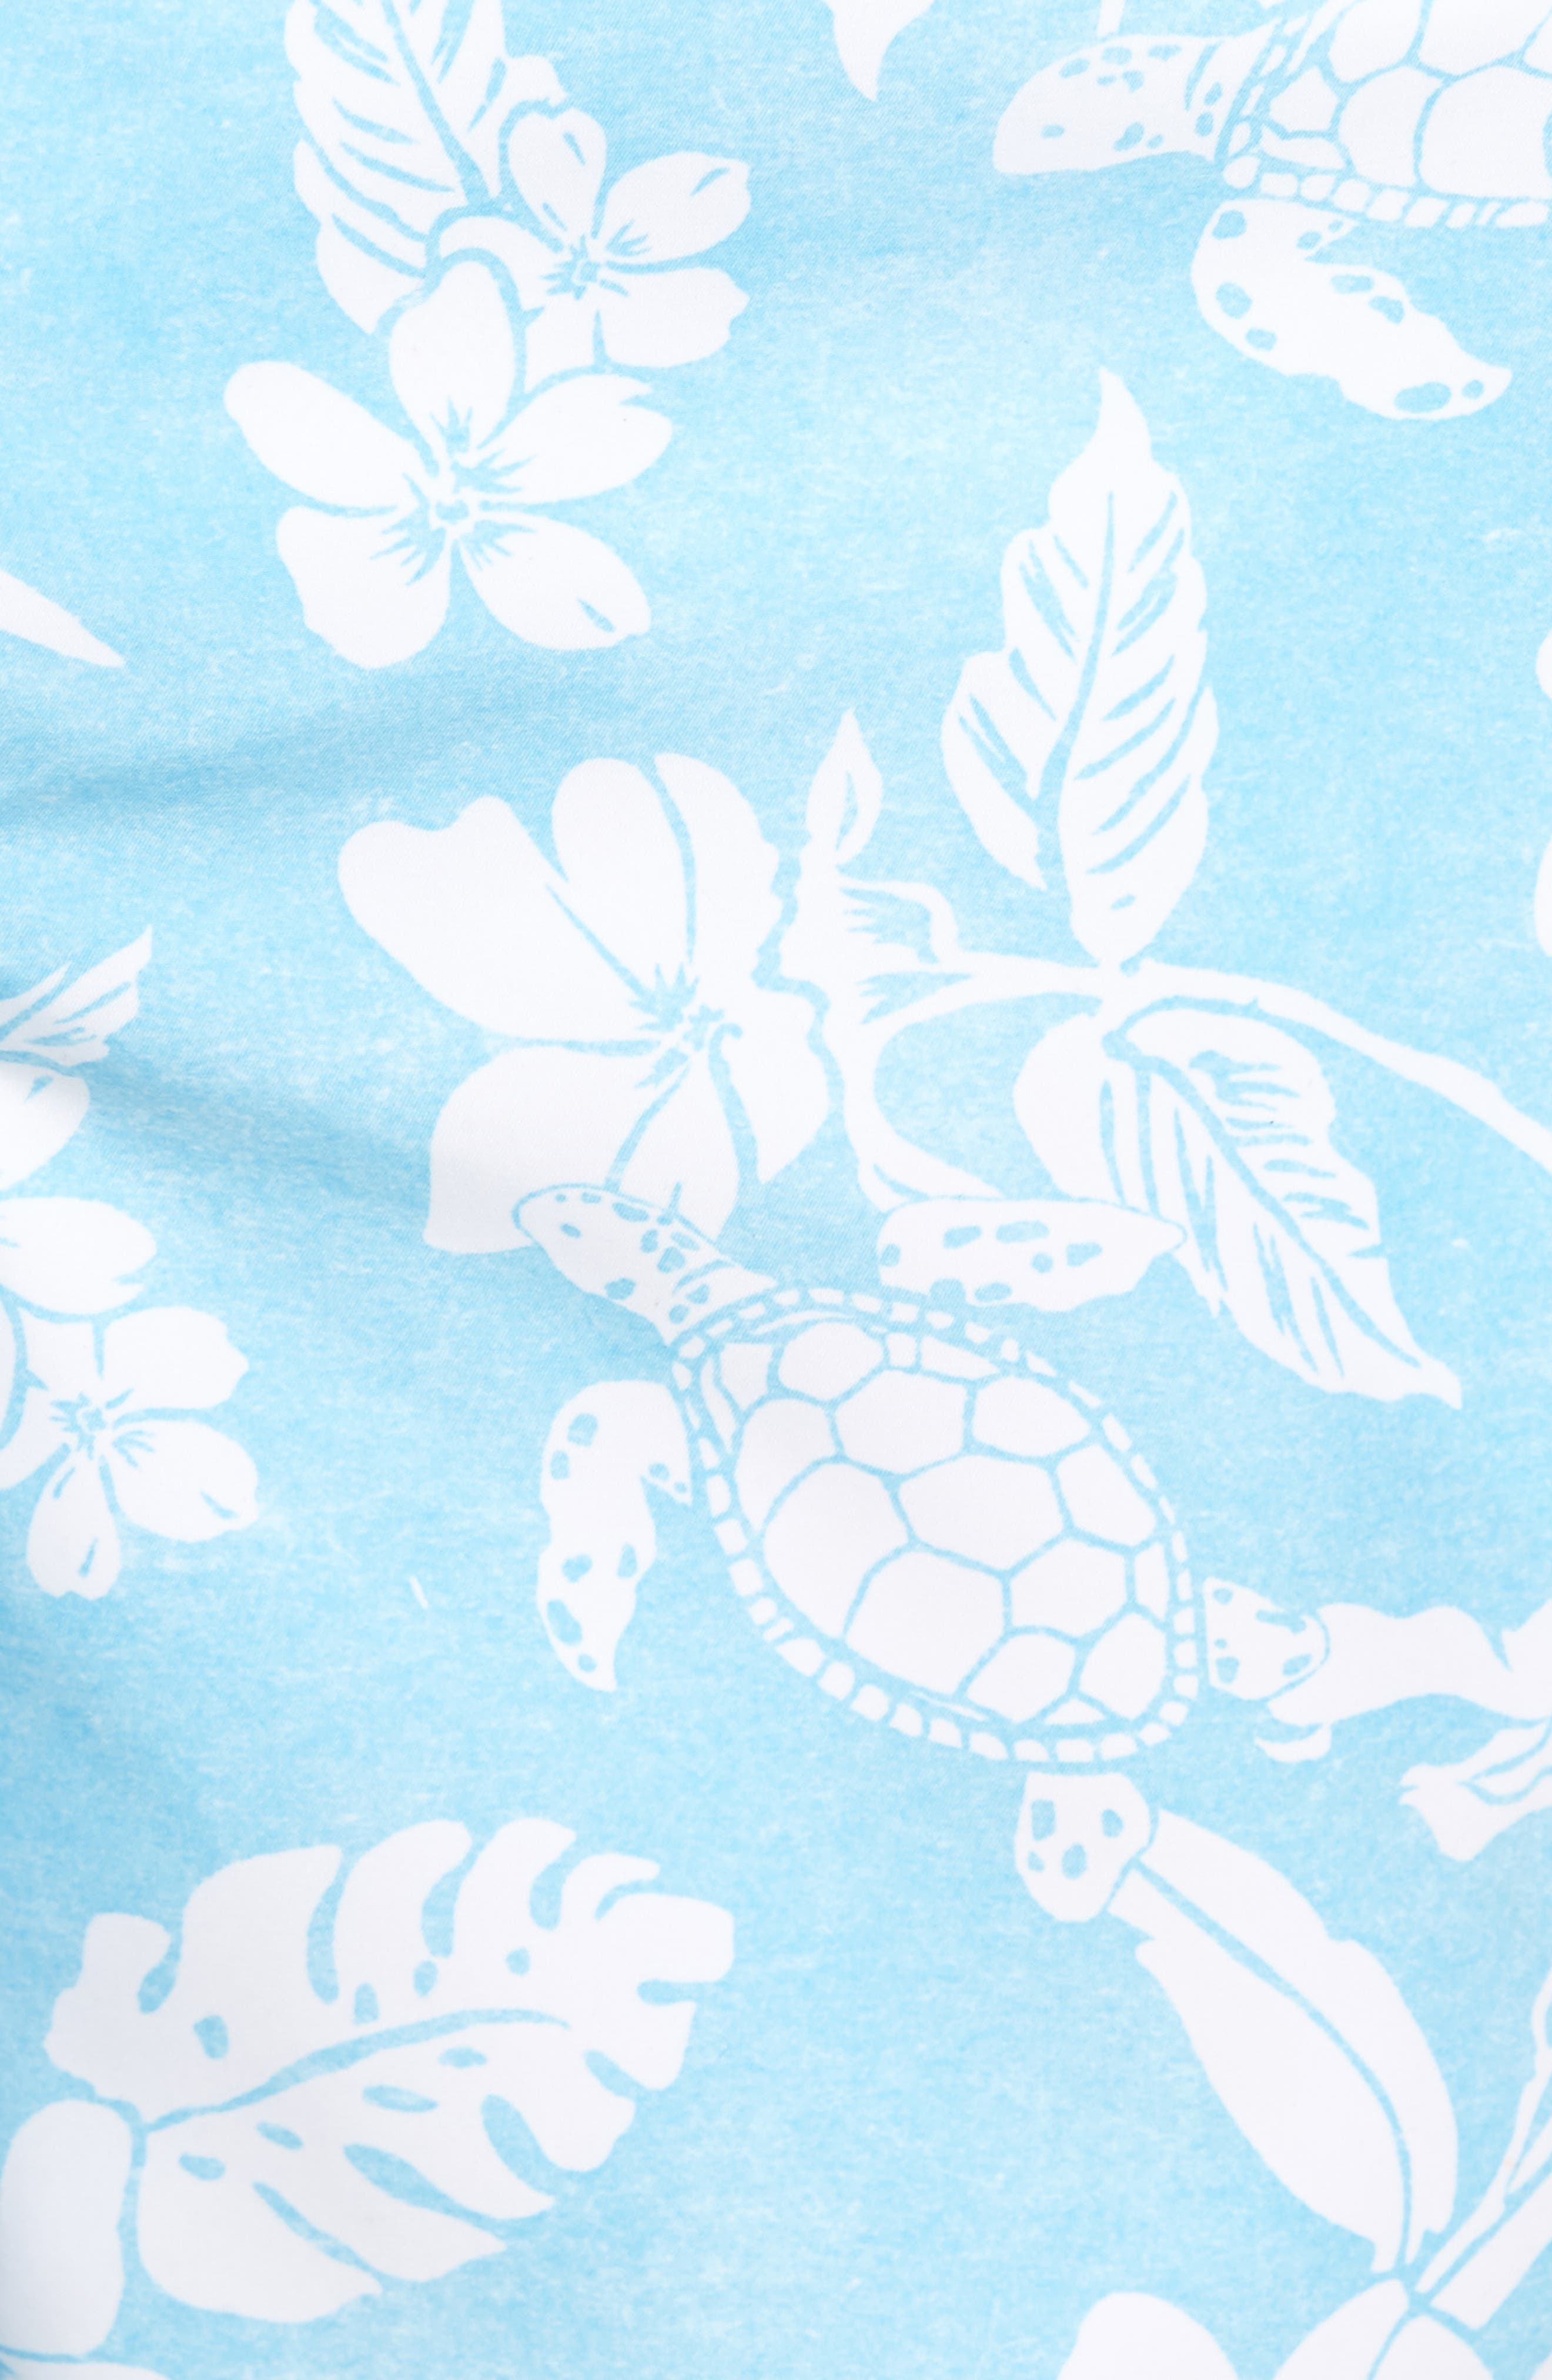 Naples Turtle Beach Swim Trunks,                             Alternate thumbnail 5, color,                             Breeze Blue